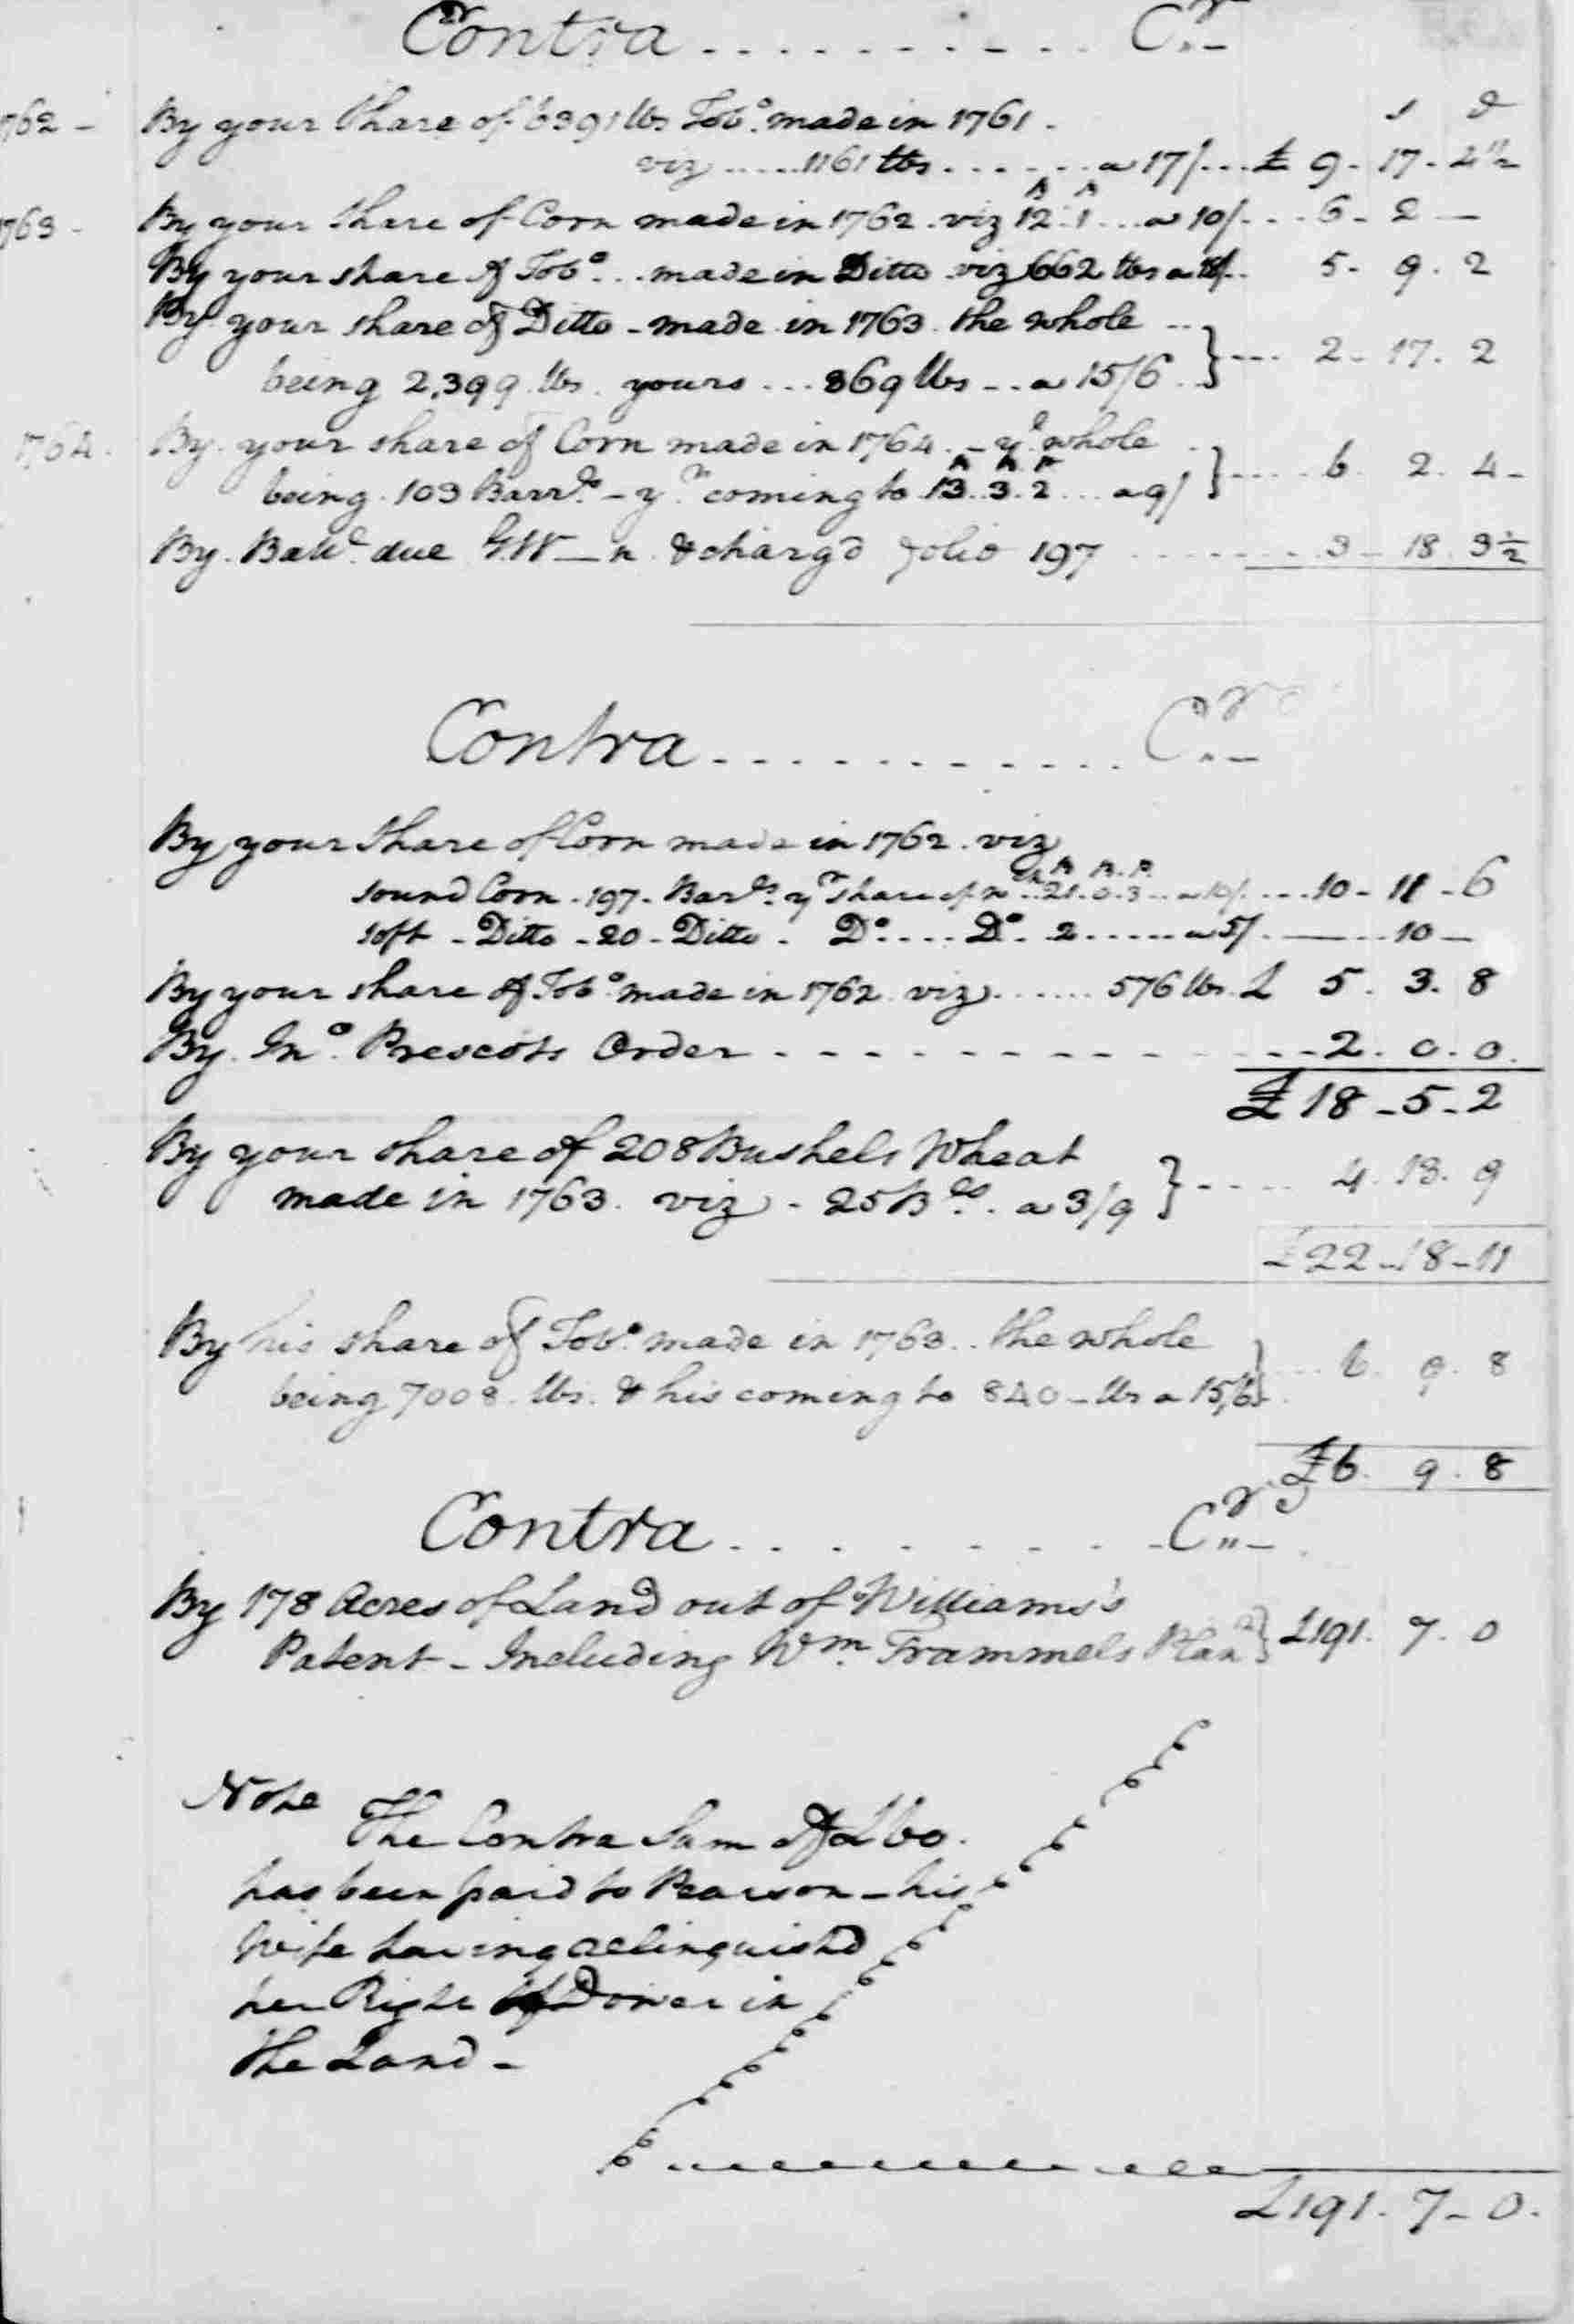 Ledger A, folio 132, right side